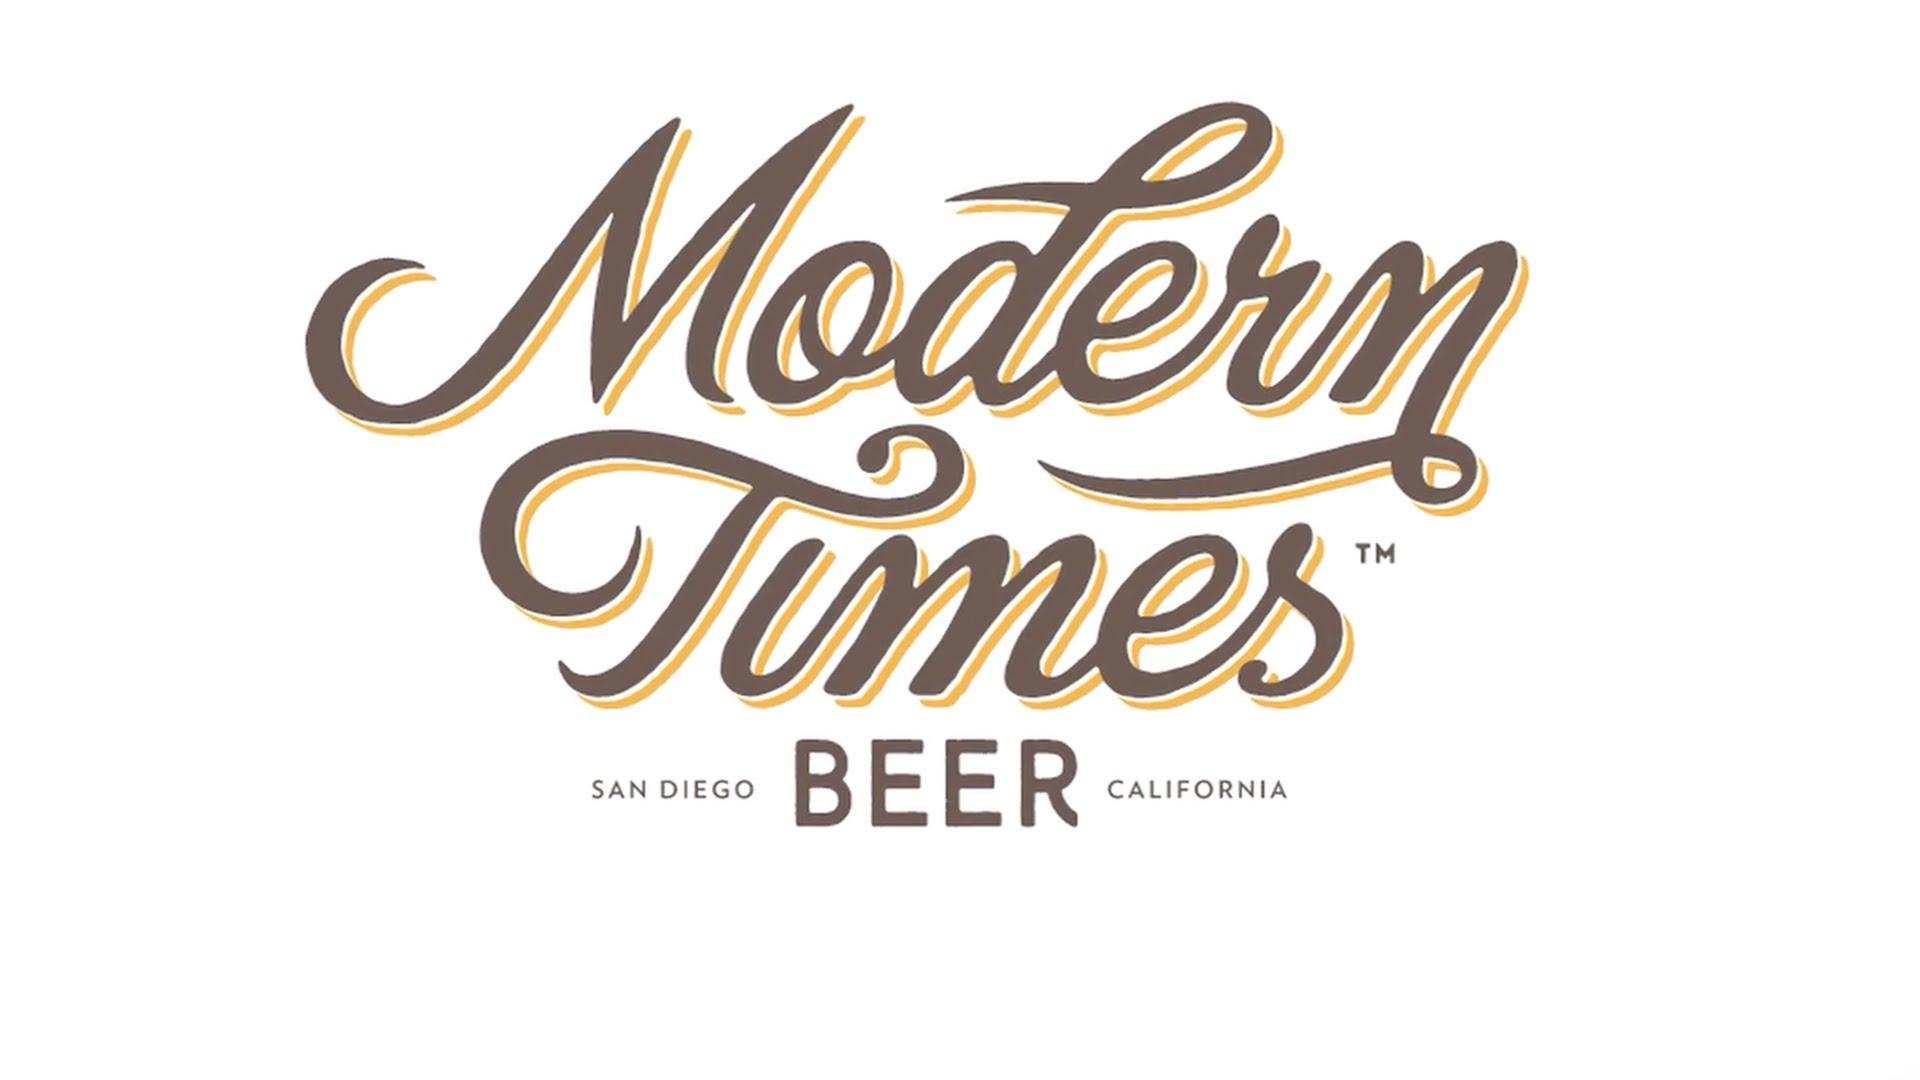 San Diego's Modern Times Beer Hits NYC